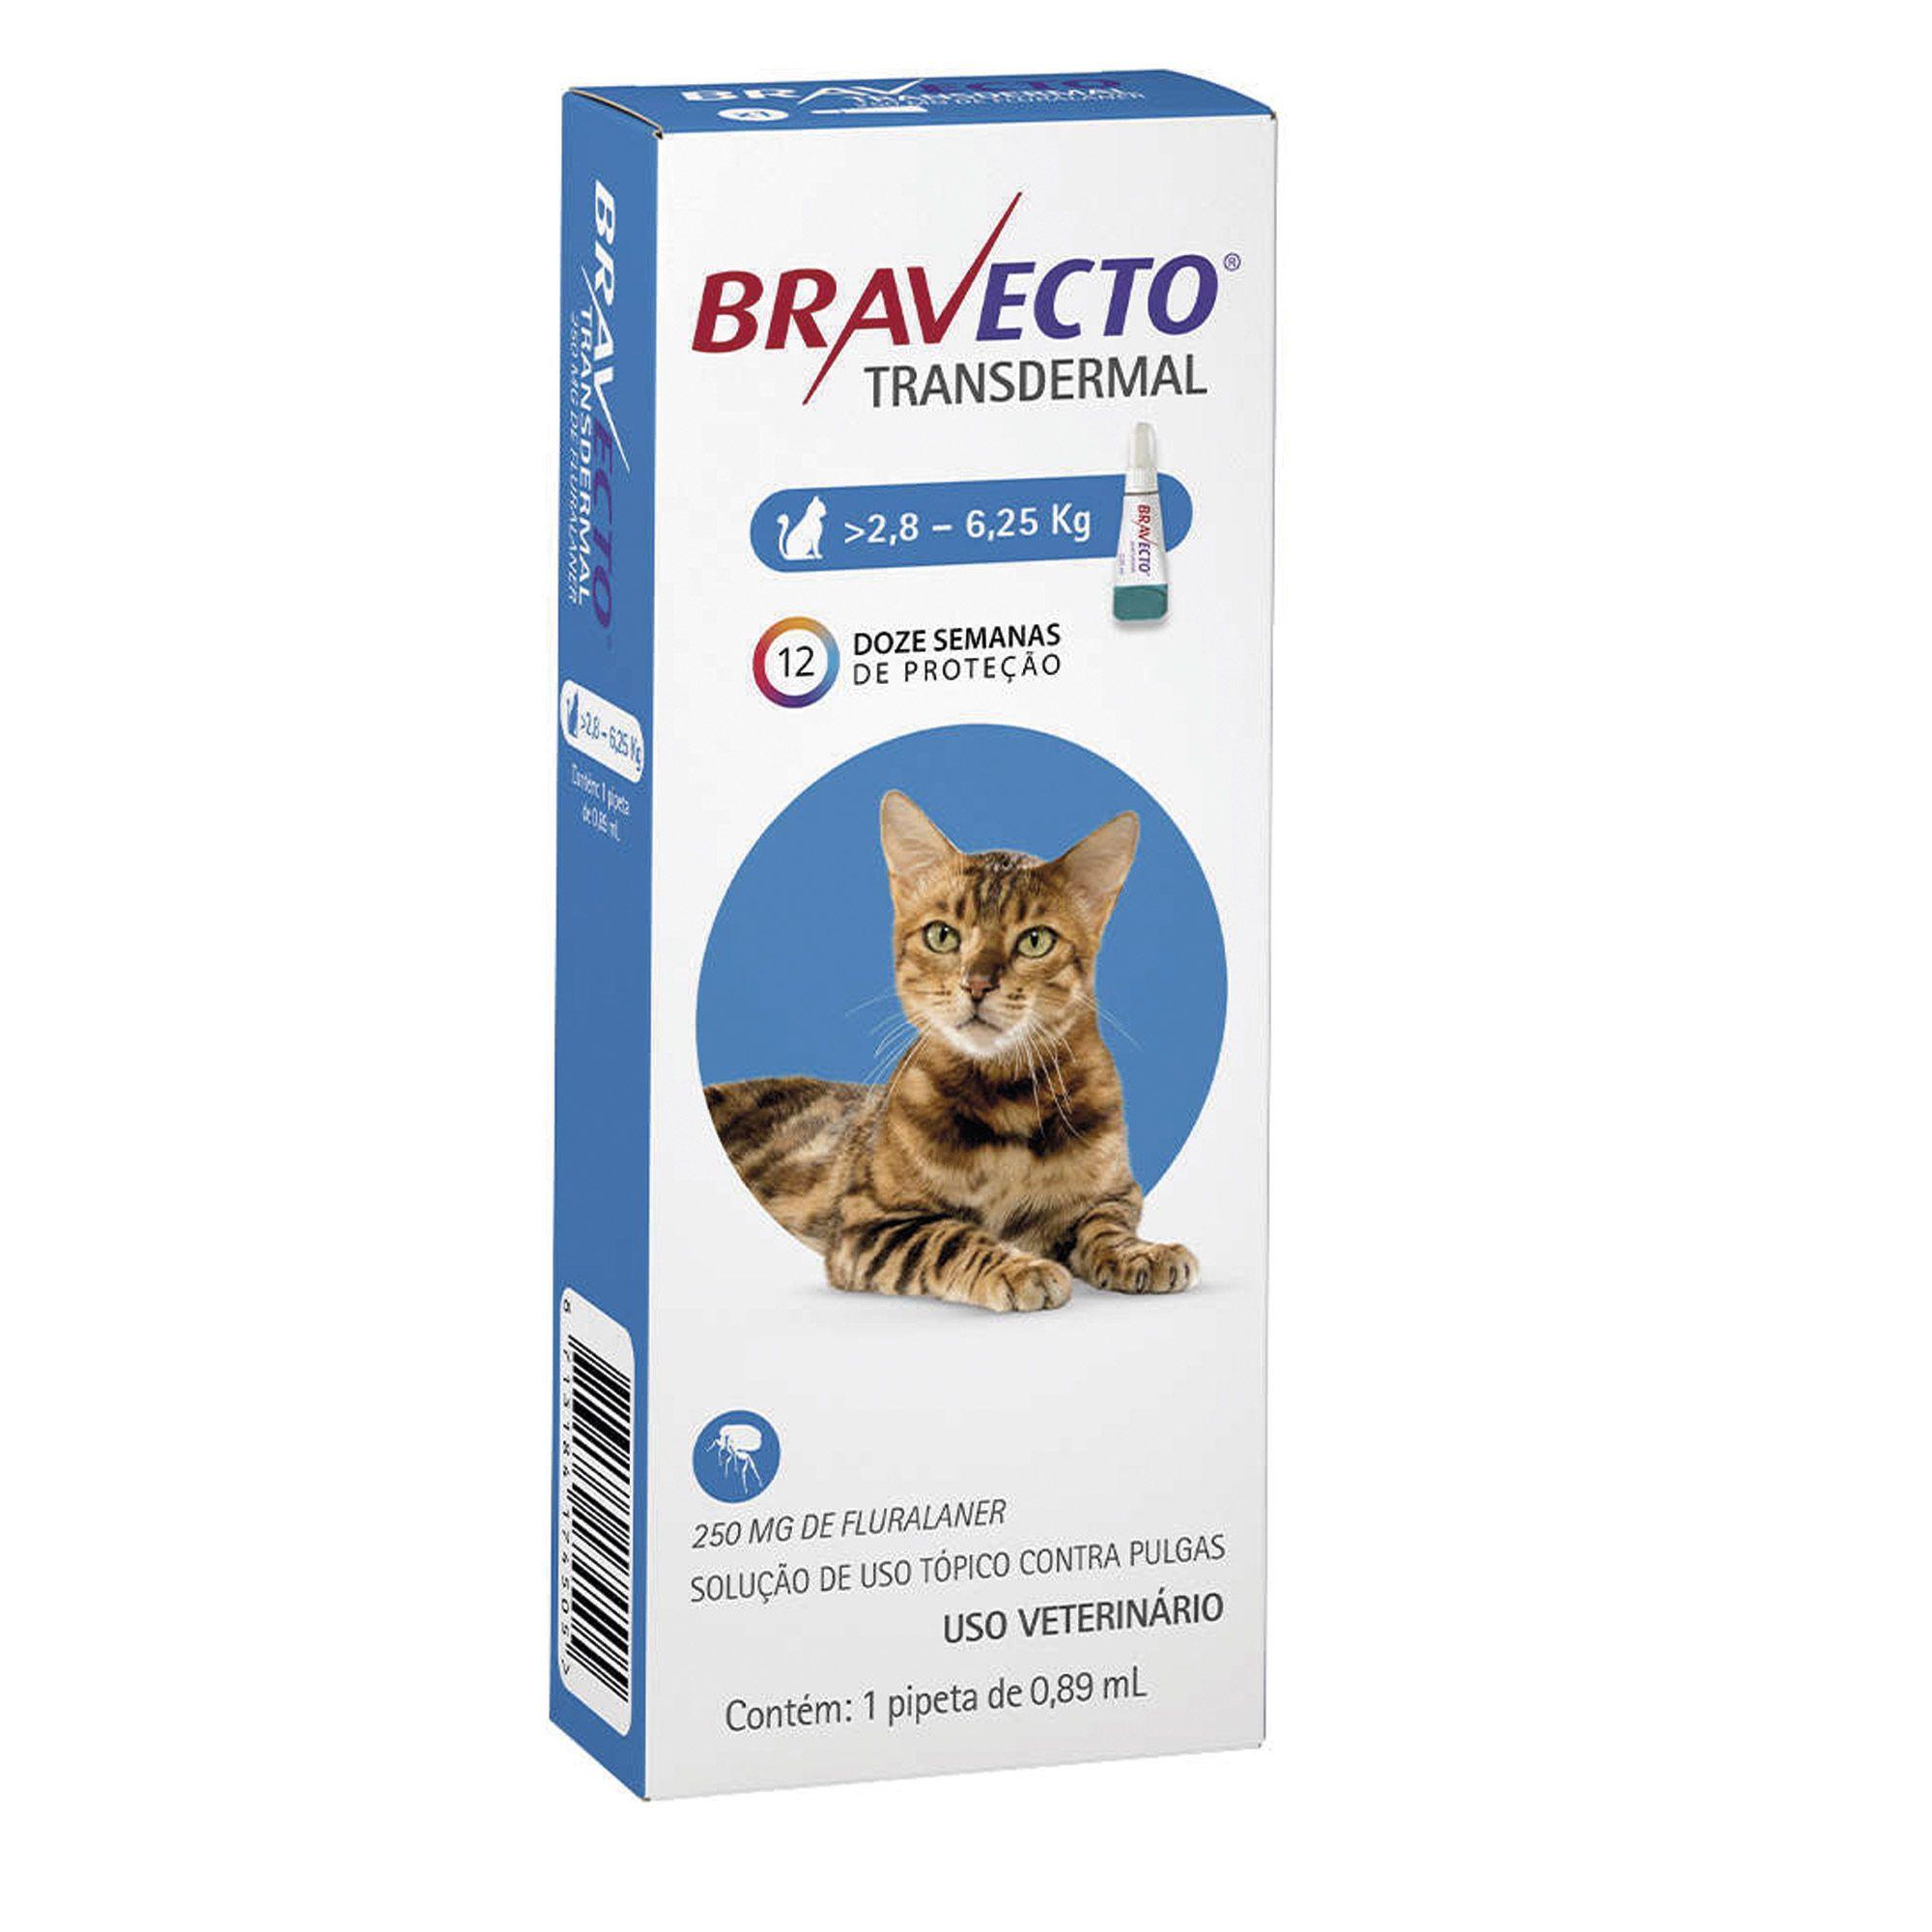 Bravecto Antipulgas Para Gatos de 2,8 a 6,25 kg Transdermal